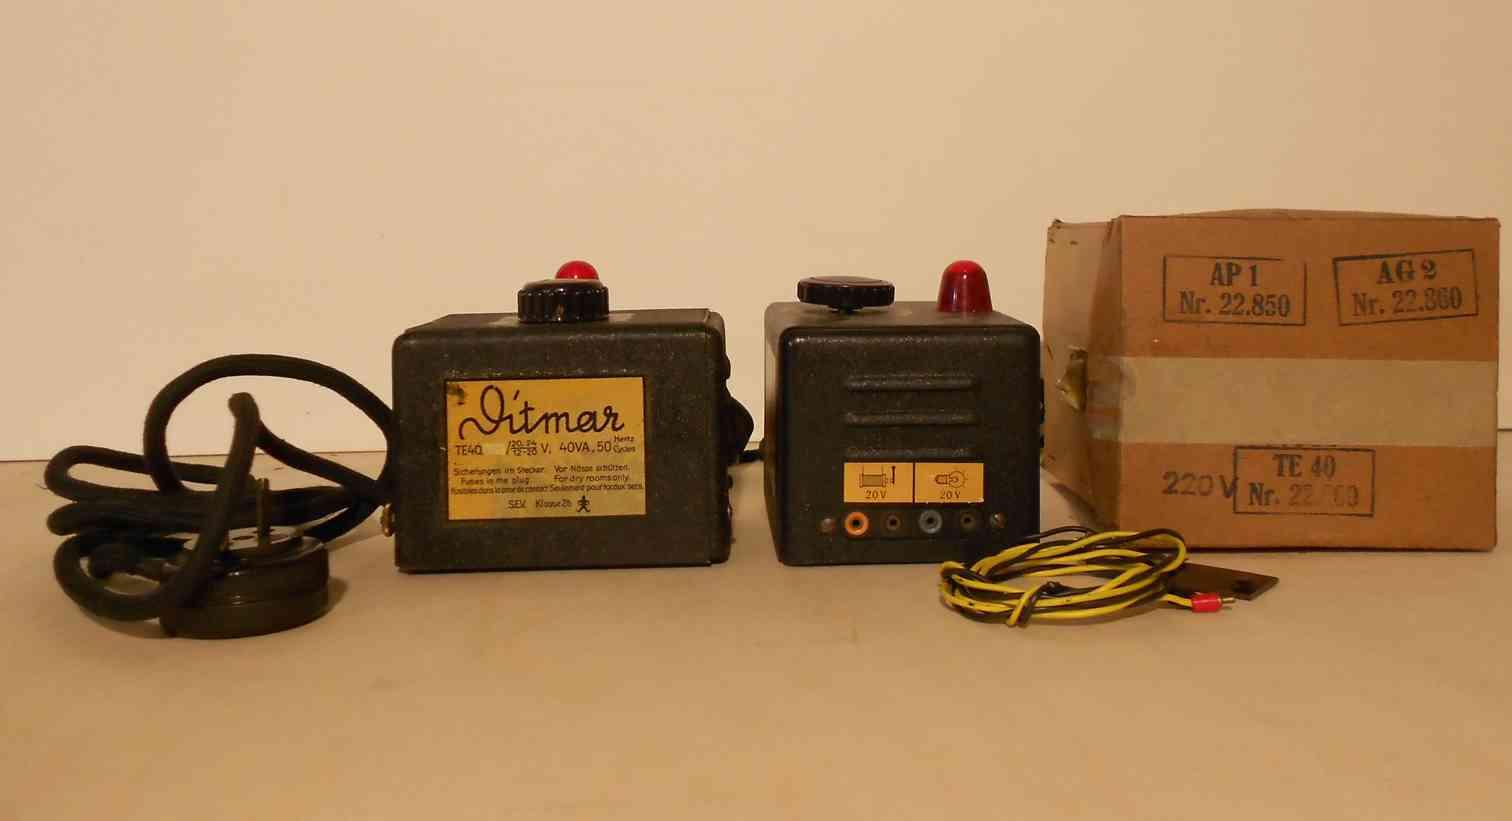 ditmar te 40 22.800 railway toy transformer 40va 110 220 volts